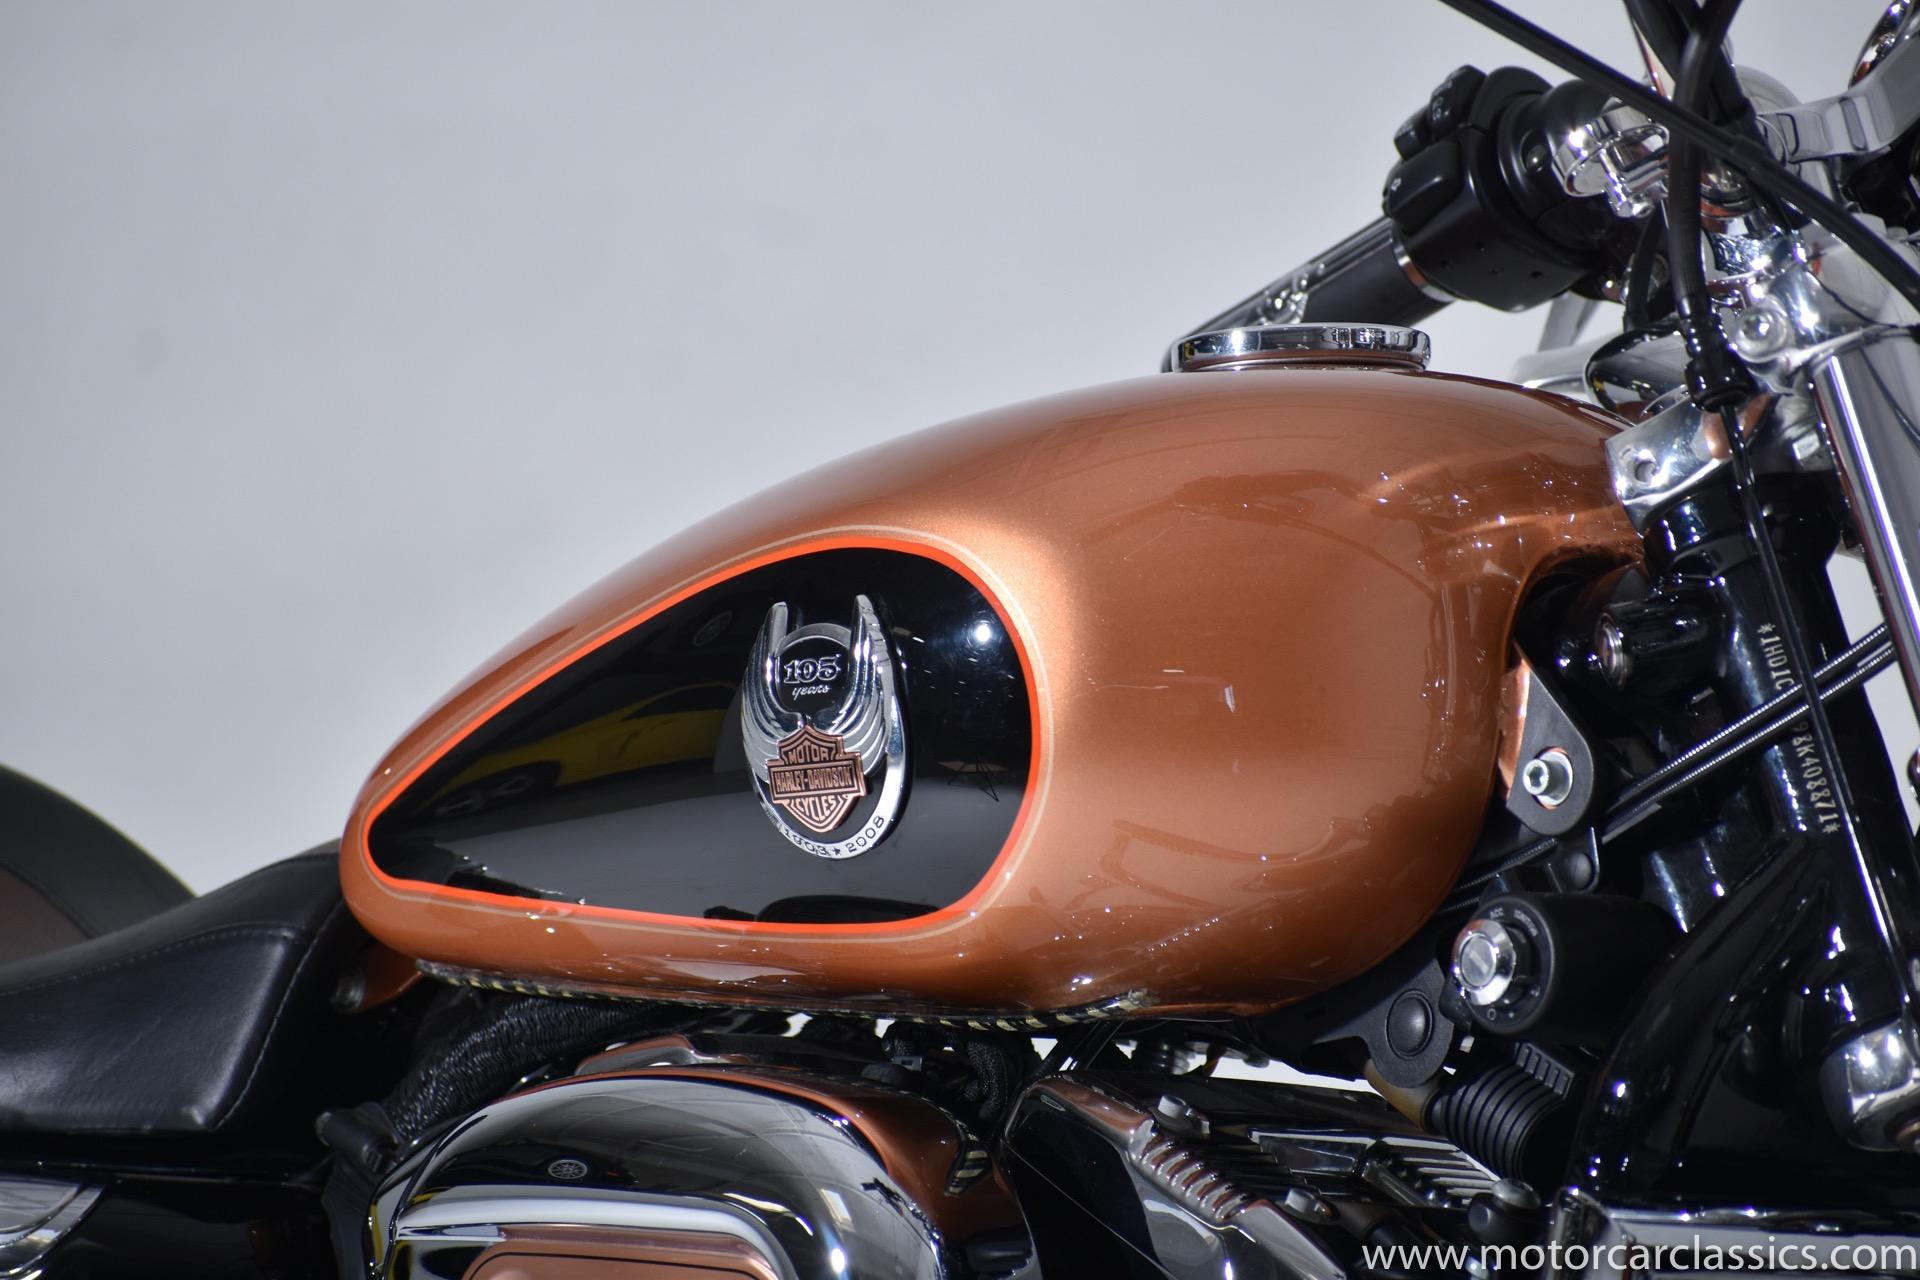 2008 Harley-Davidson XL1200